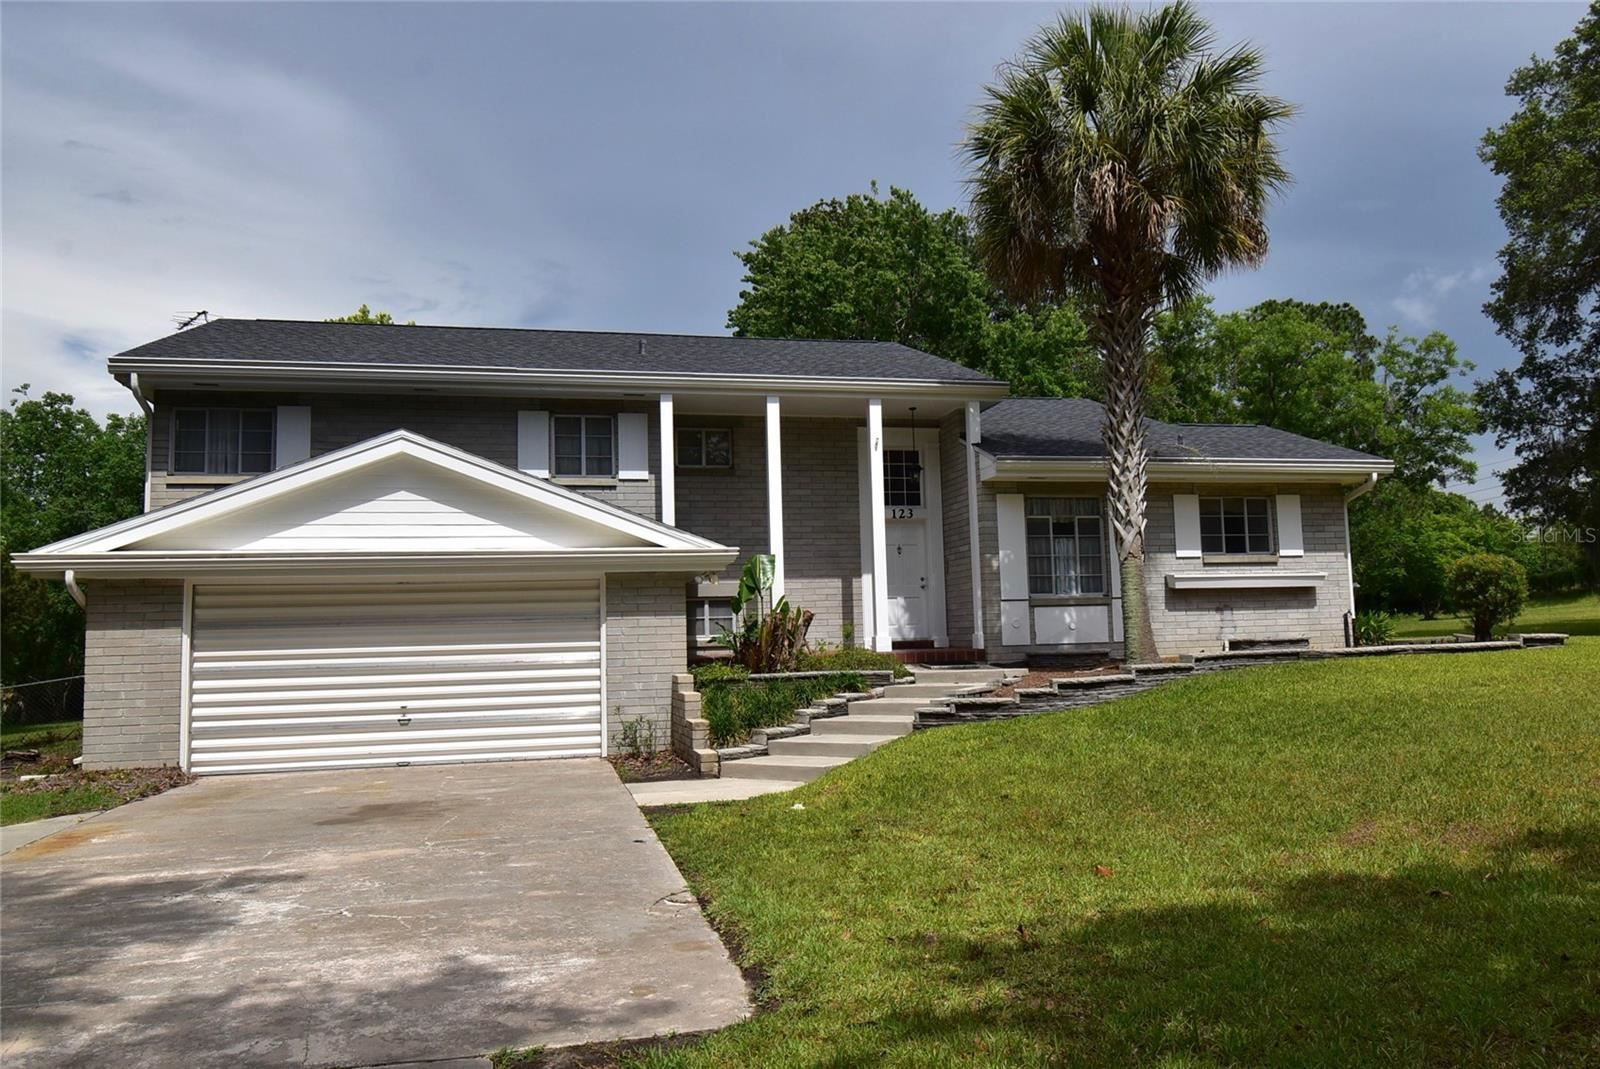 123 NW 7TH STREET, Williston, FL 32696 - #: OM621613